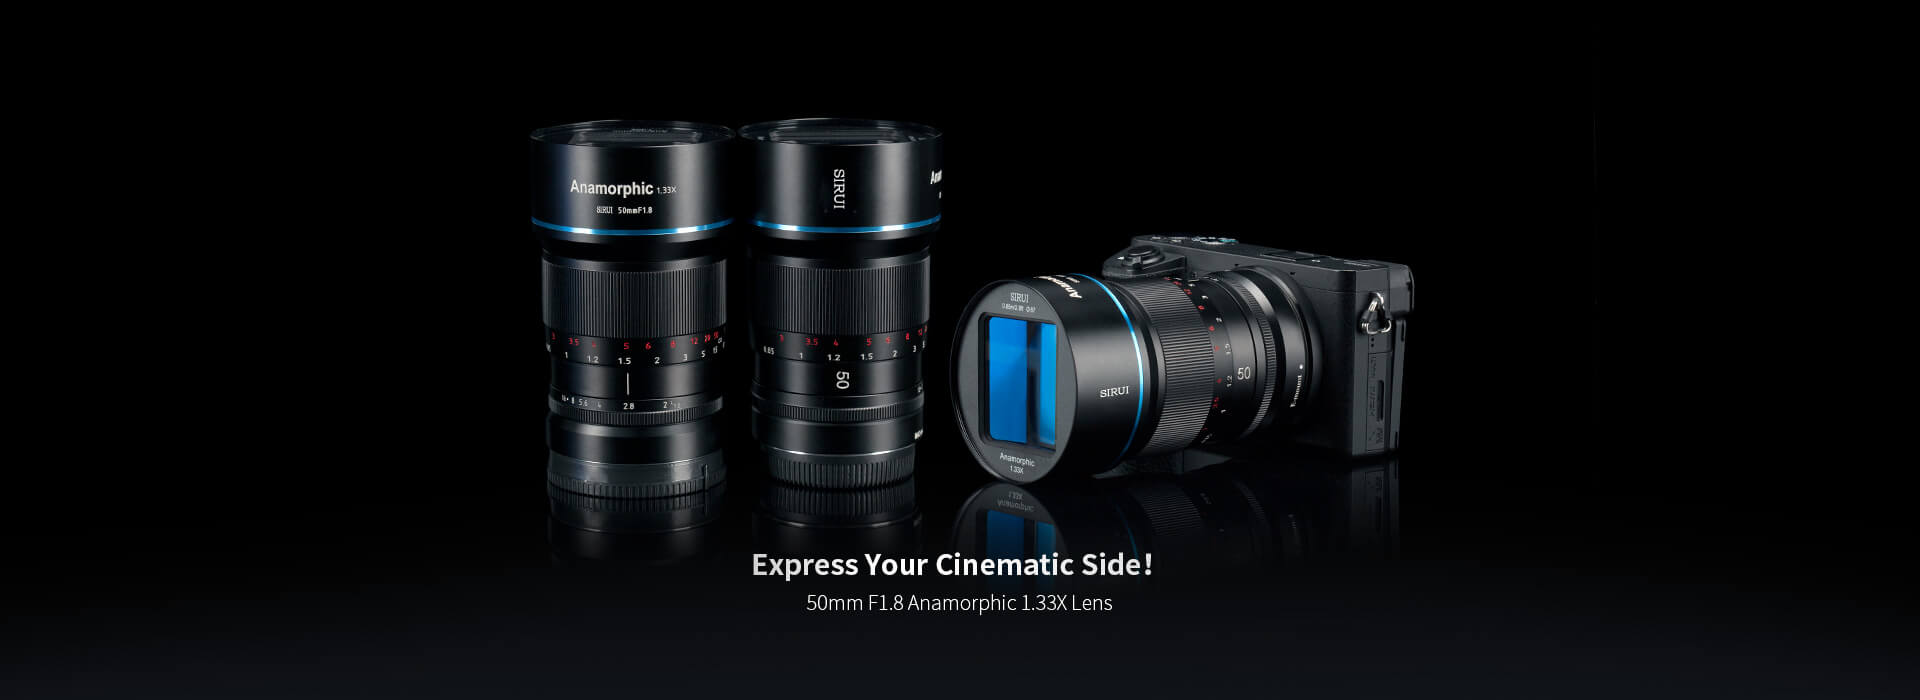 Sirui Anamorphic Lens 50mm